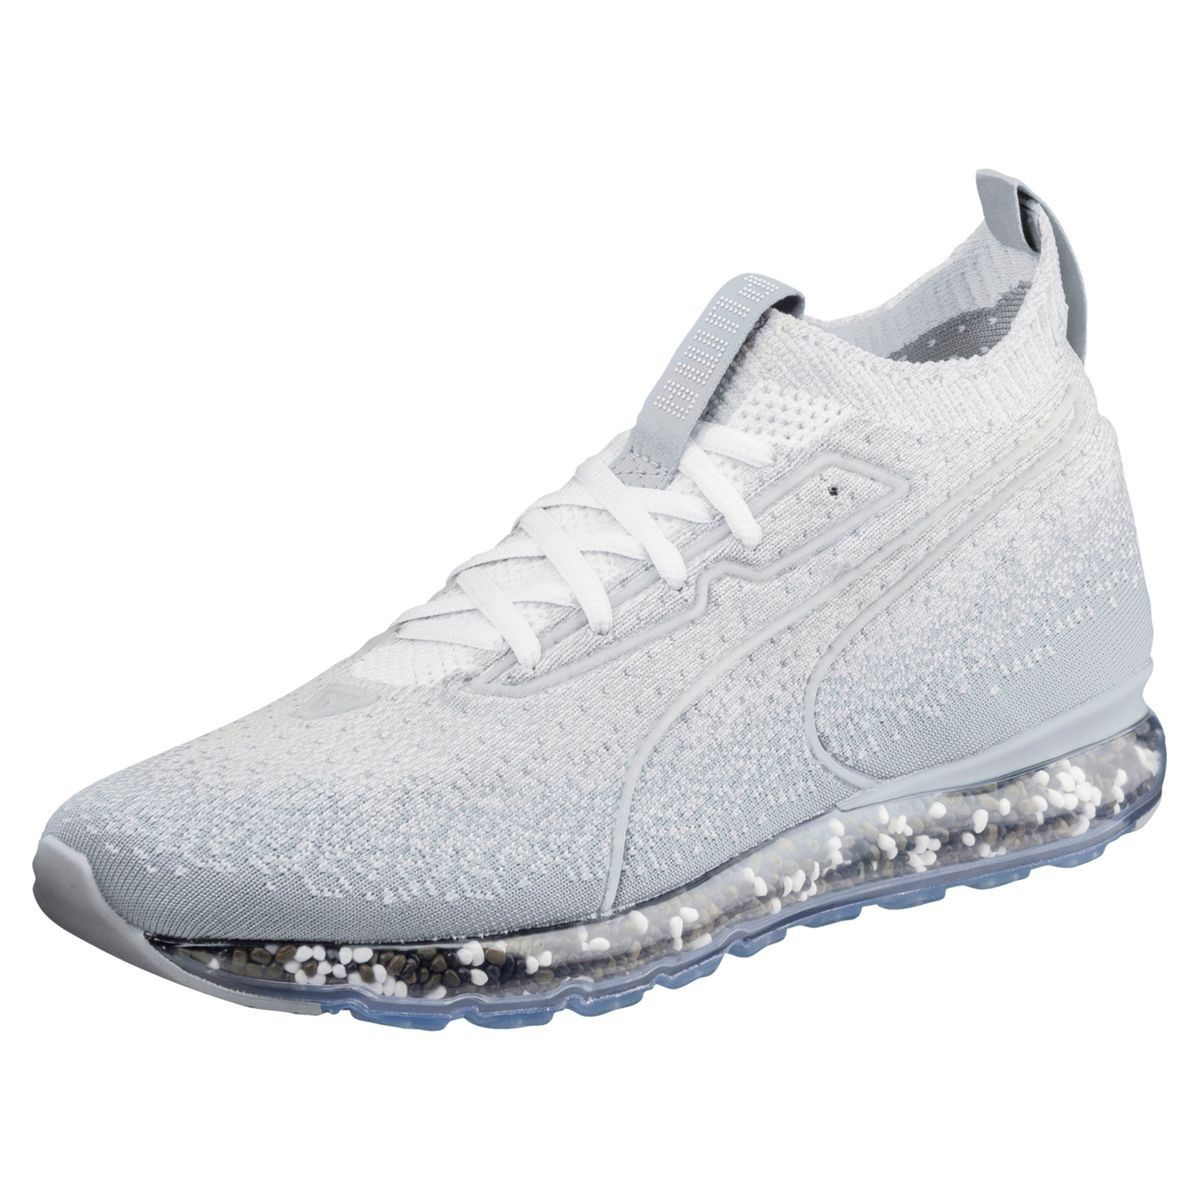 chaussure puma homme 48